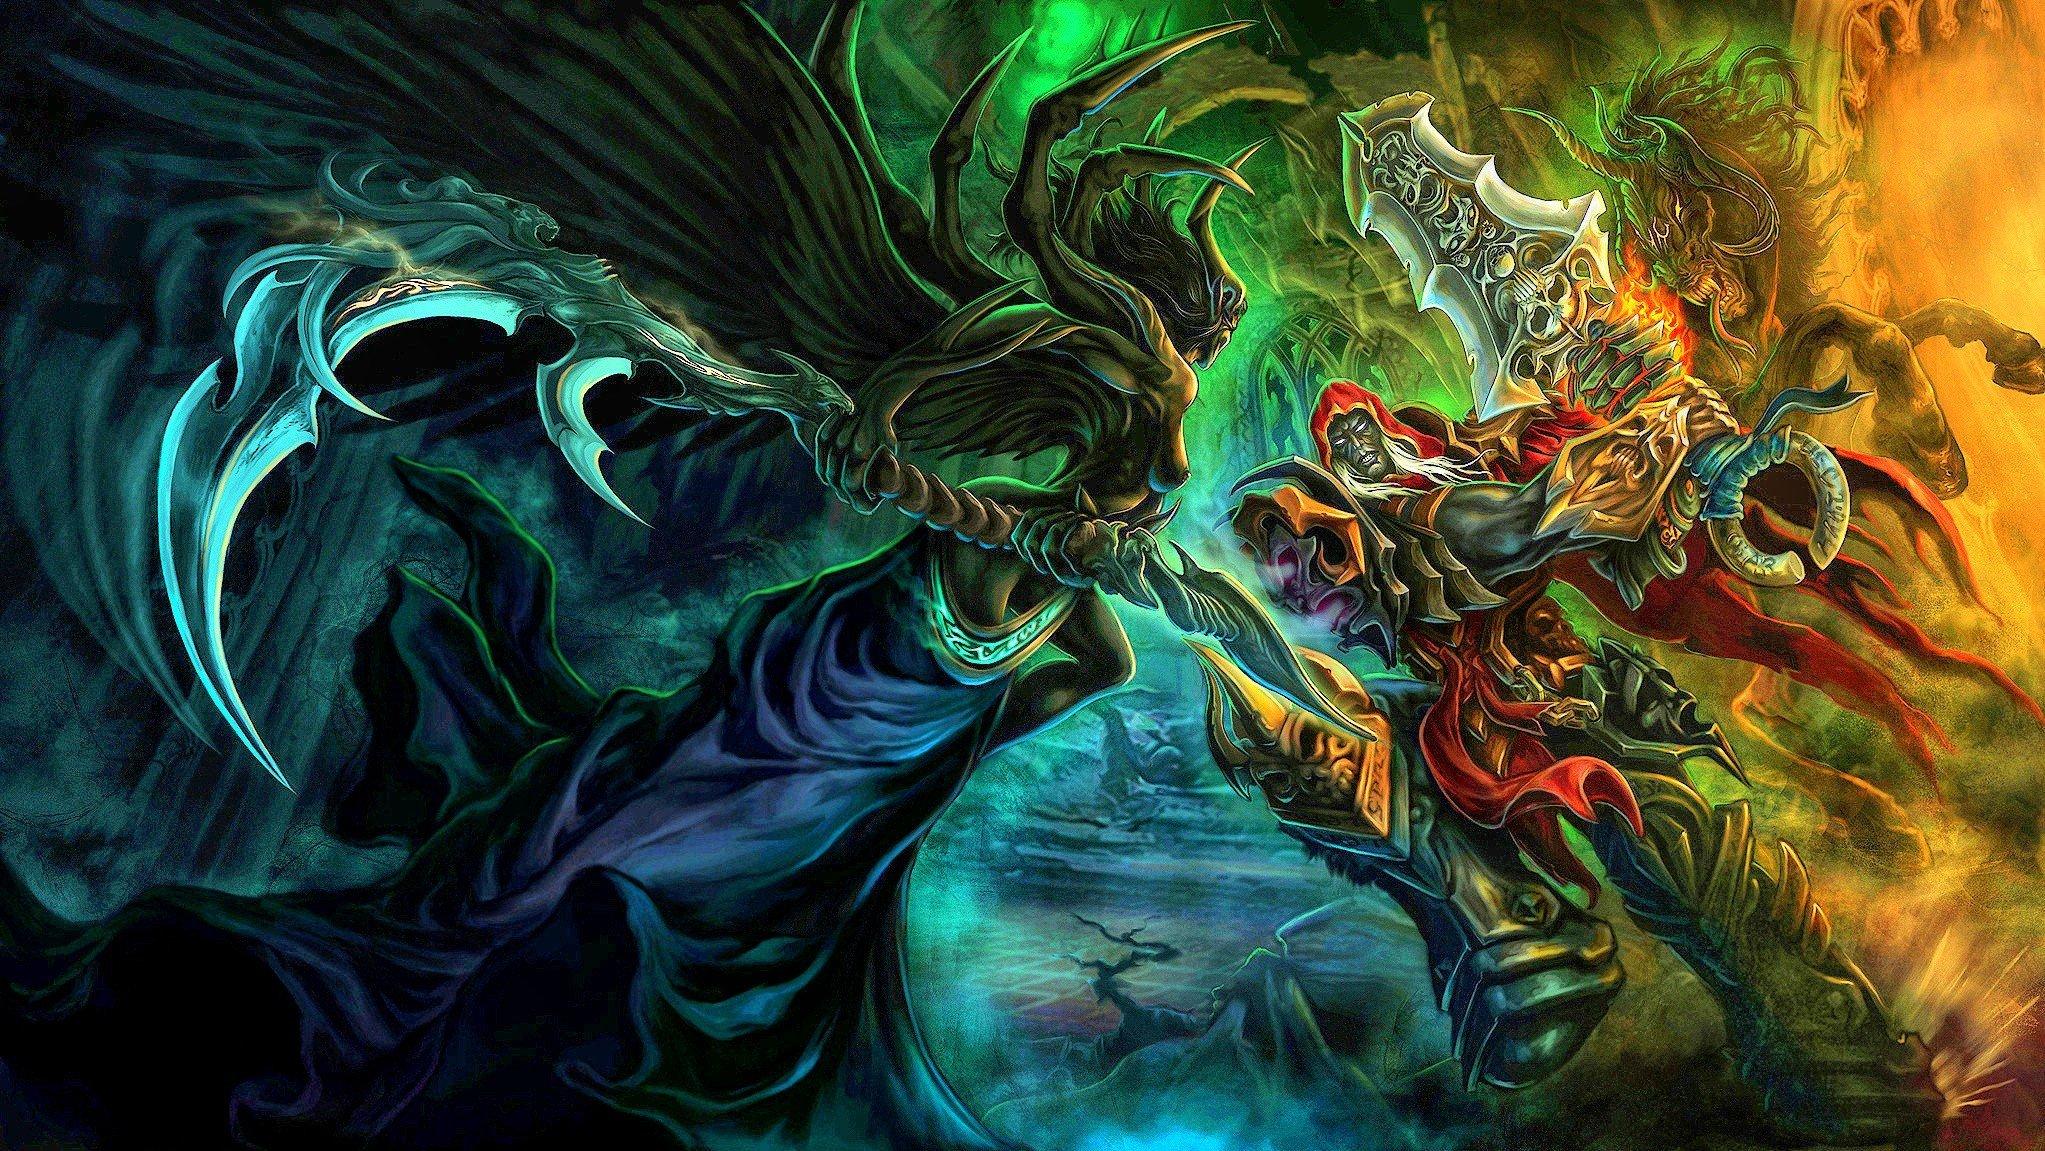 Wallpaper : 2045x1151 px, Darksiders, Four Horsemen of the